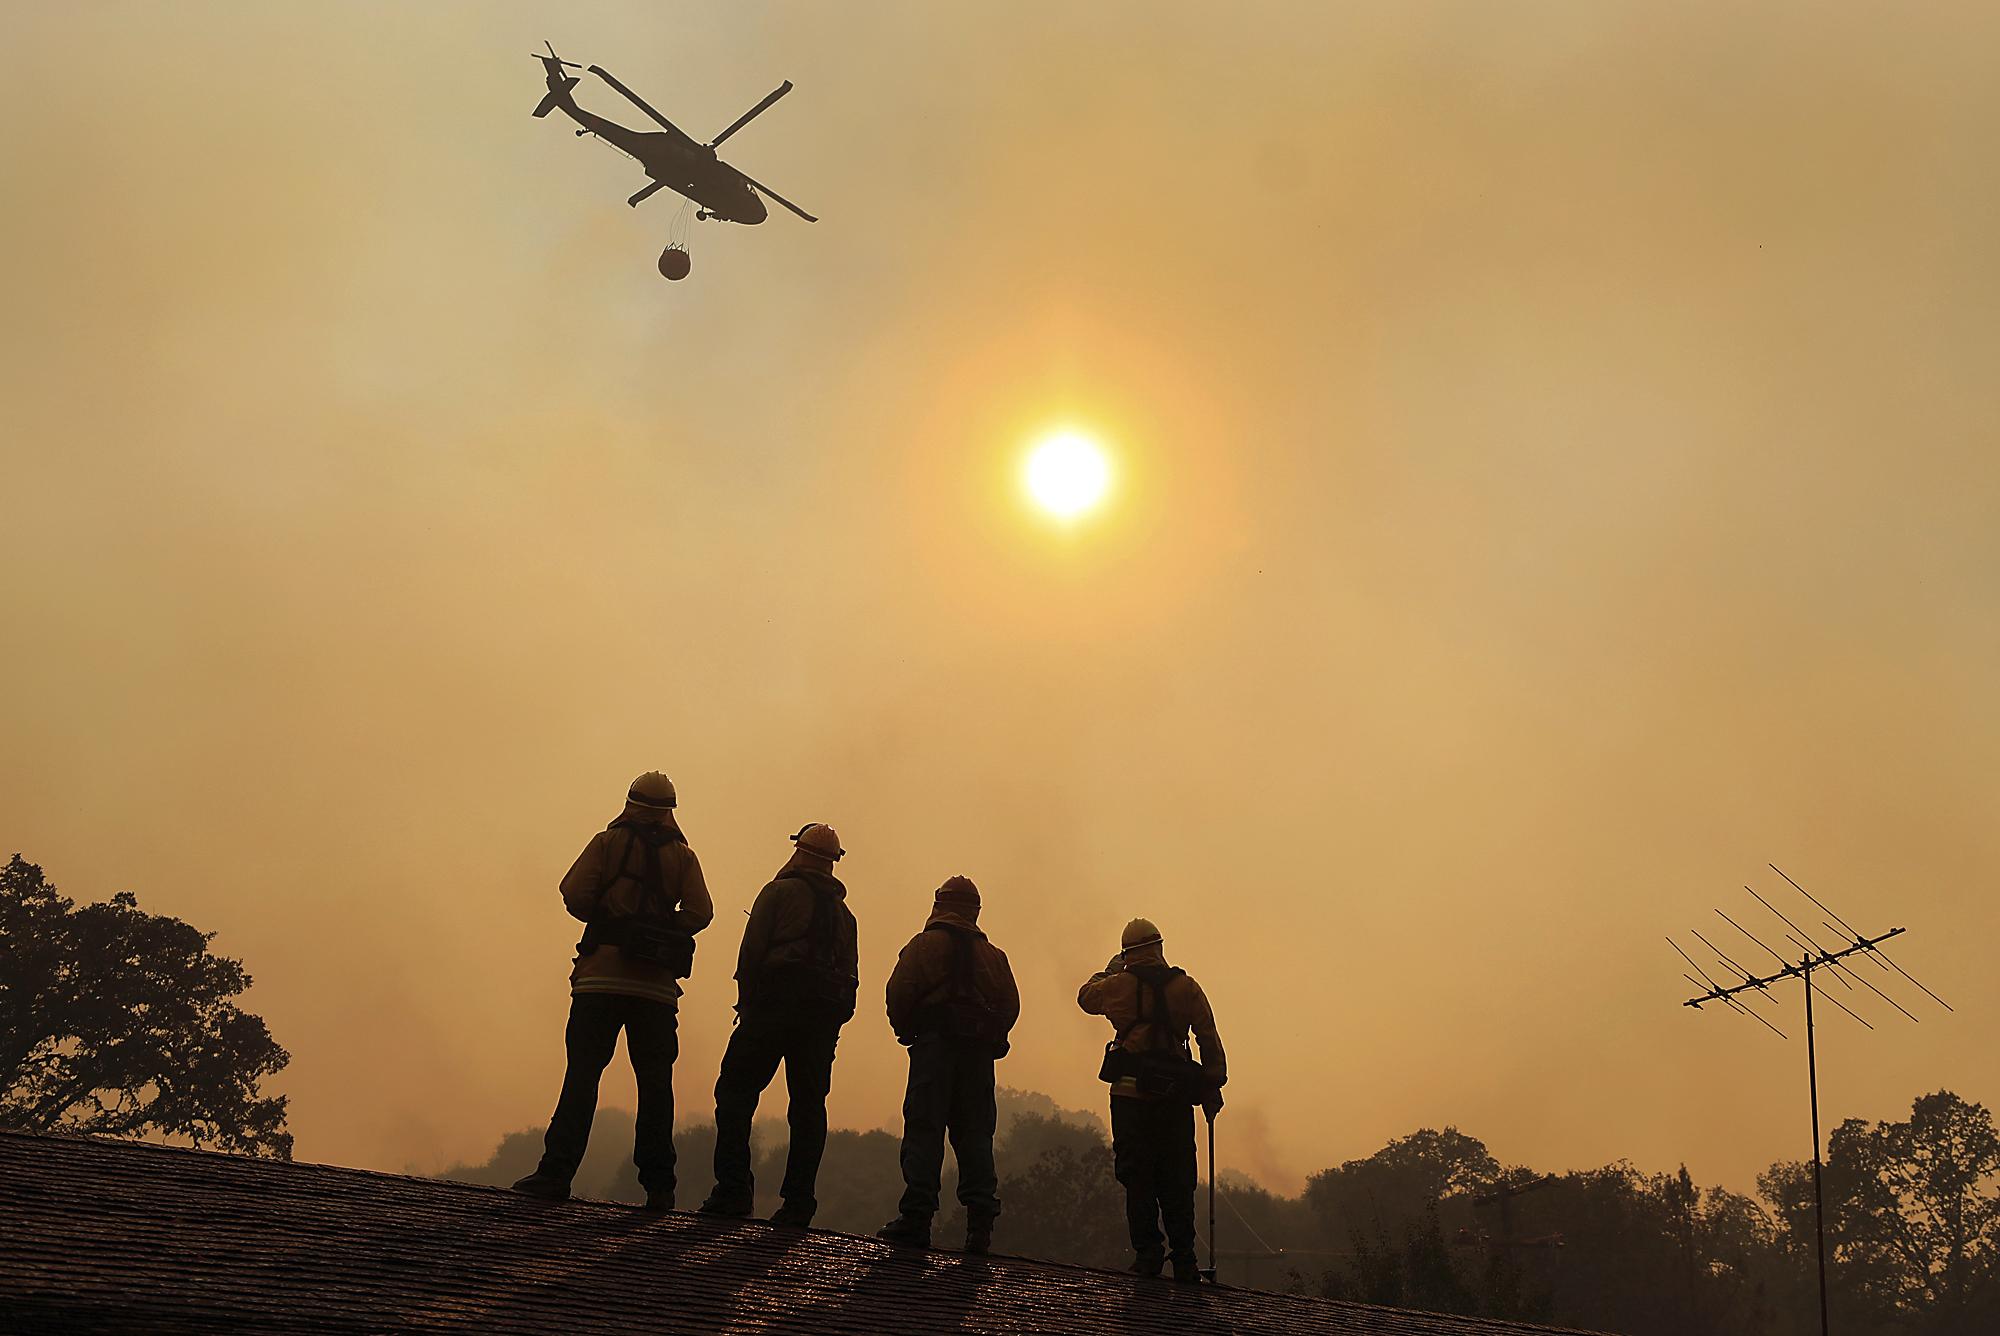 APTOPIX_California_Wildfires_57538-159532.jpg24298067